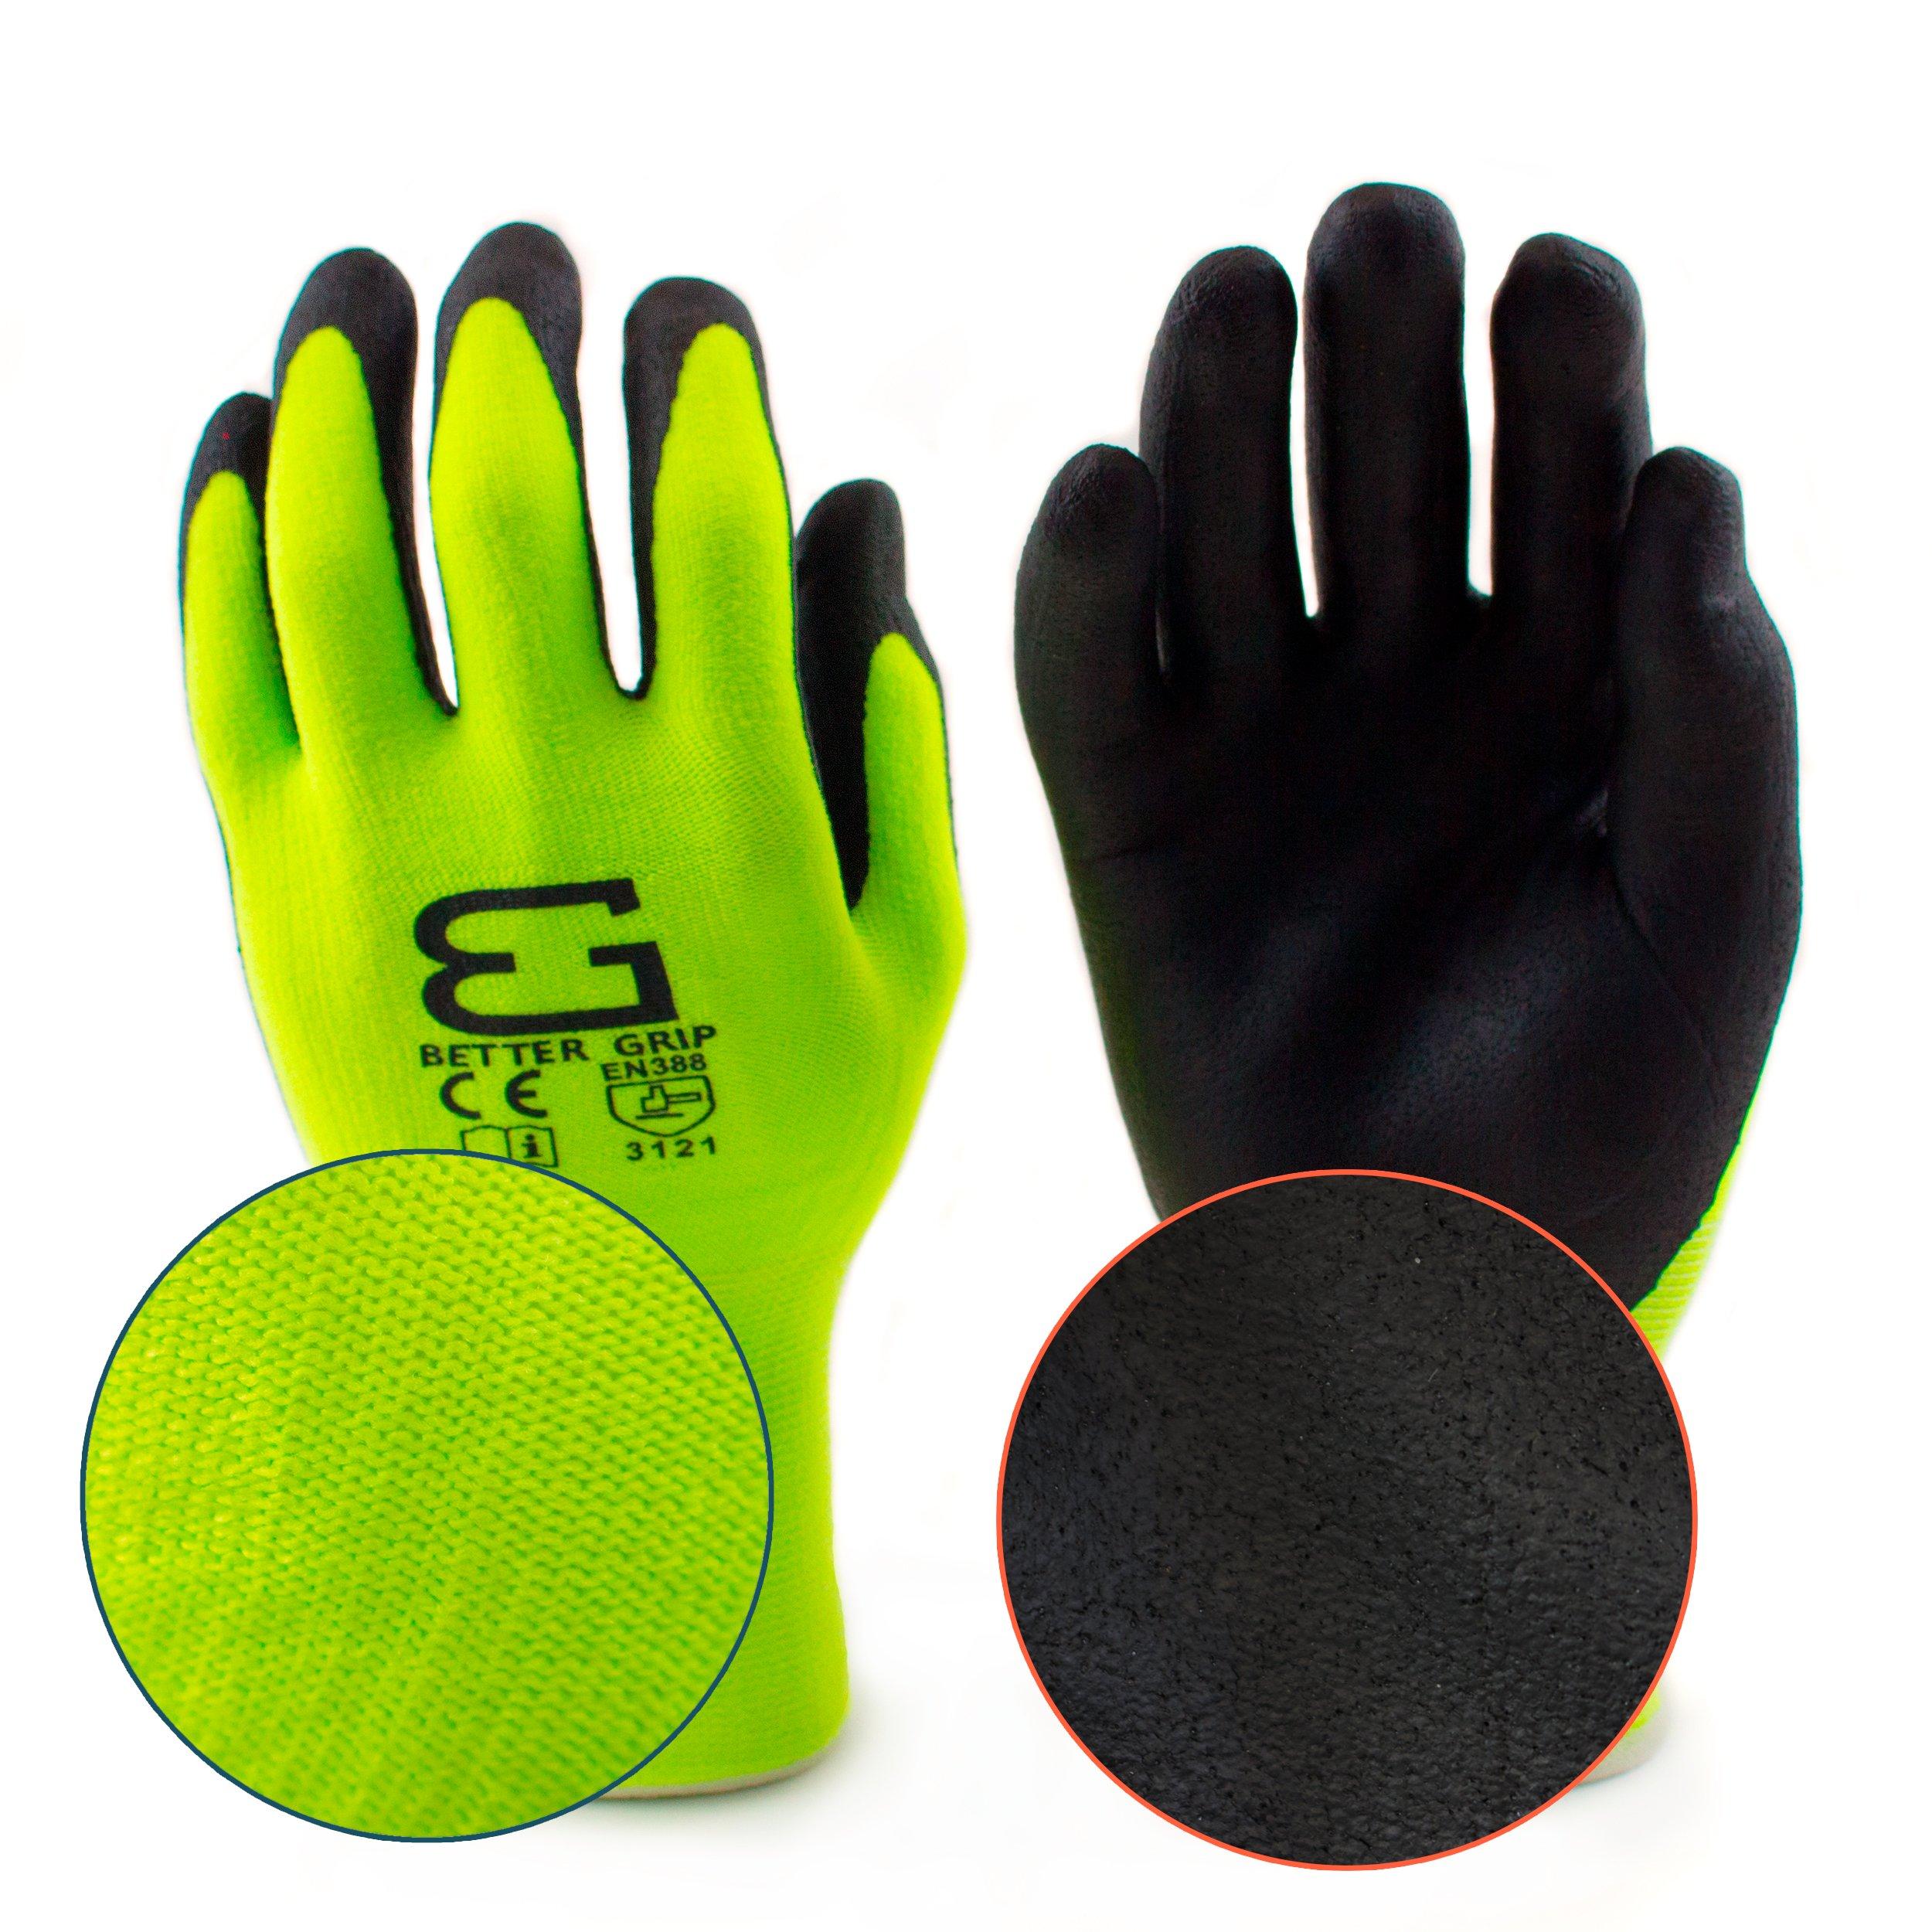 Spidergard SPL-RR50 50 Foot Wire Rope Self-Retracting Lifeline with Swivel Hook and Carabiner w/ Micro Foam Work Glove by Spidergard (Image #2)